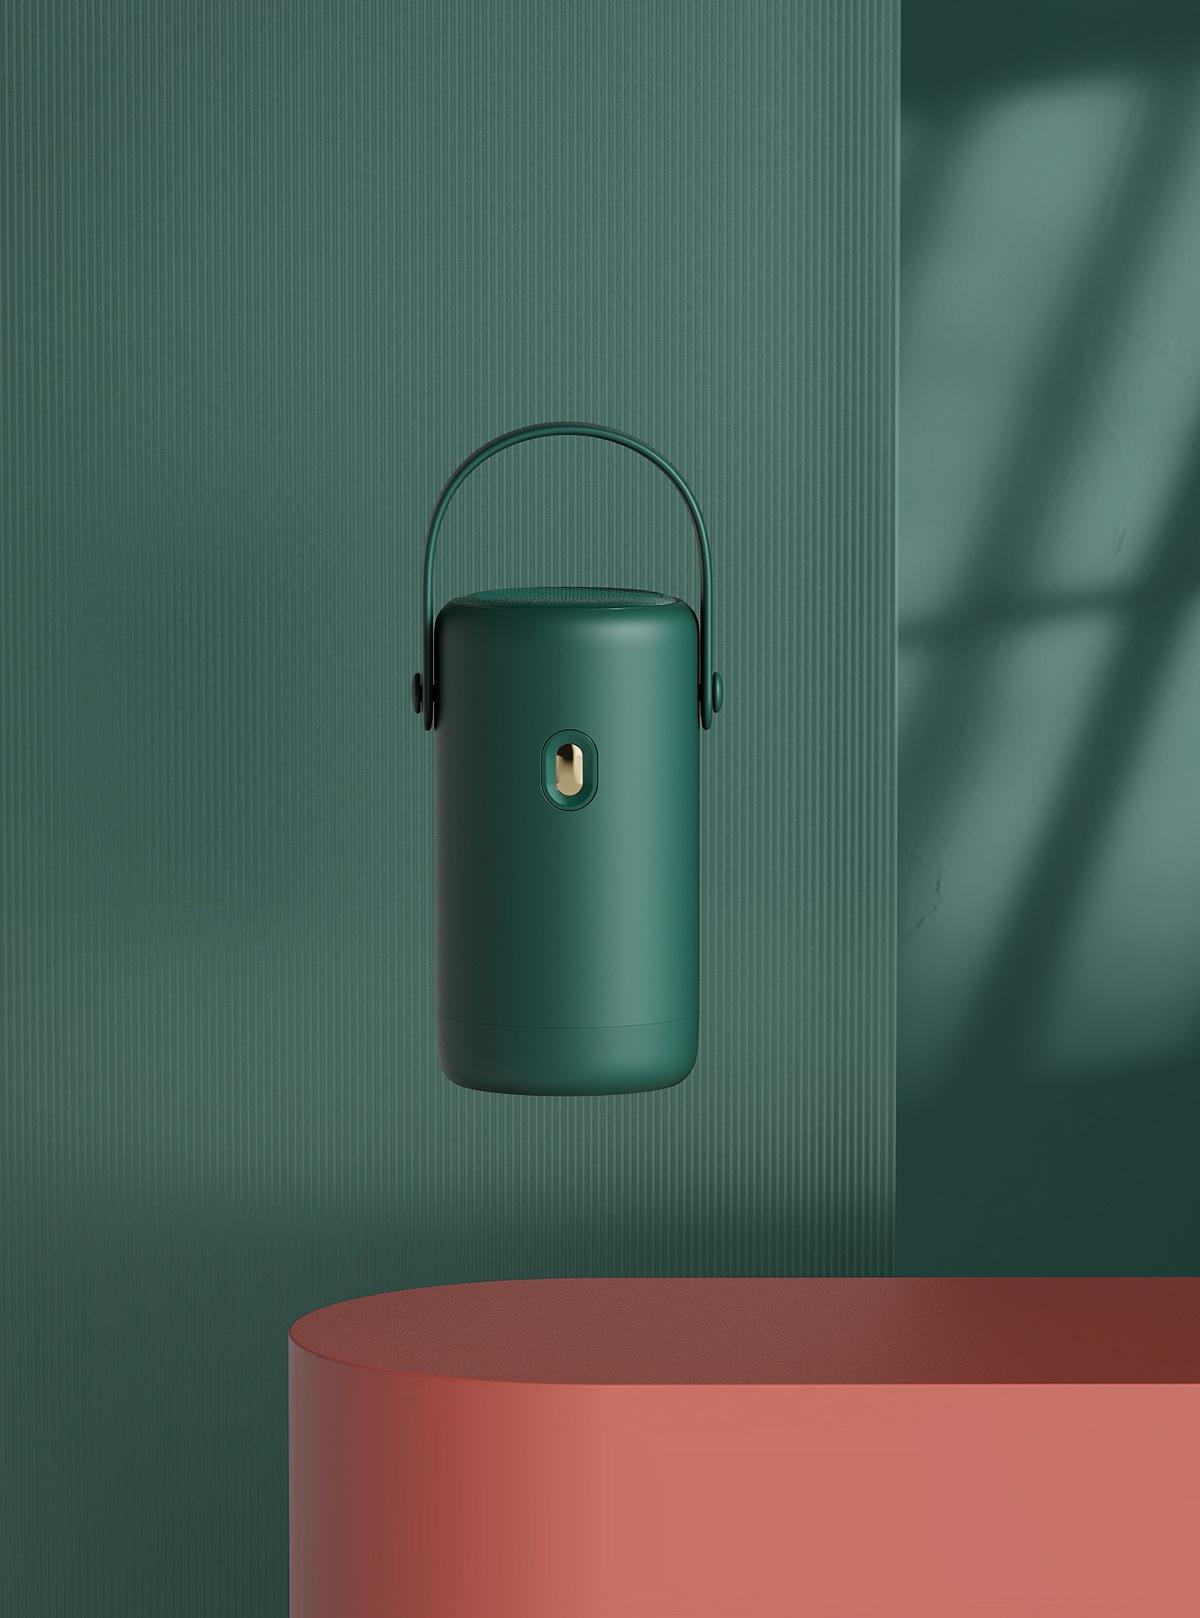 dryer portable product design  Travelling goods underware dryer